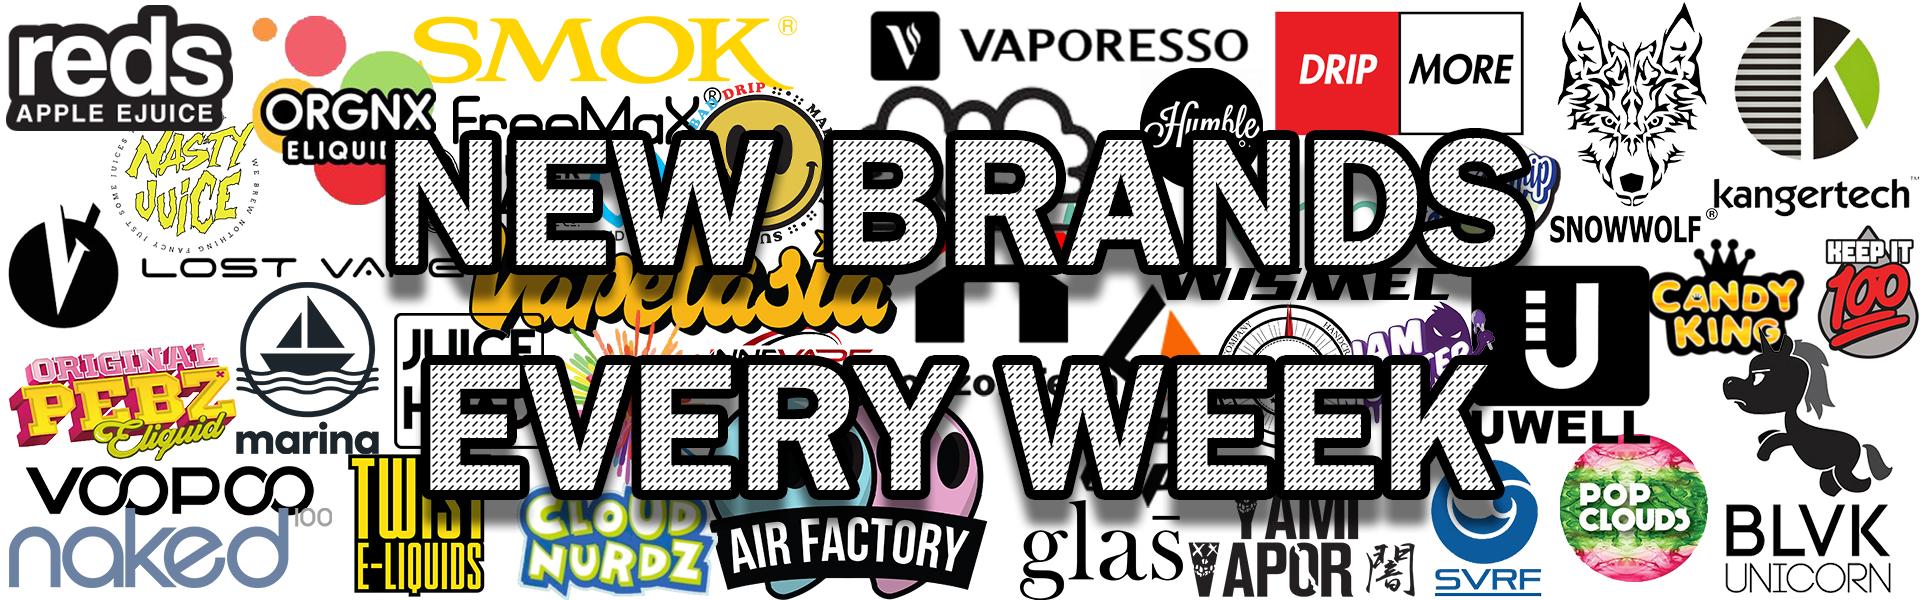 all-brands-edited-.jpg